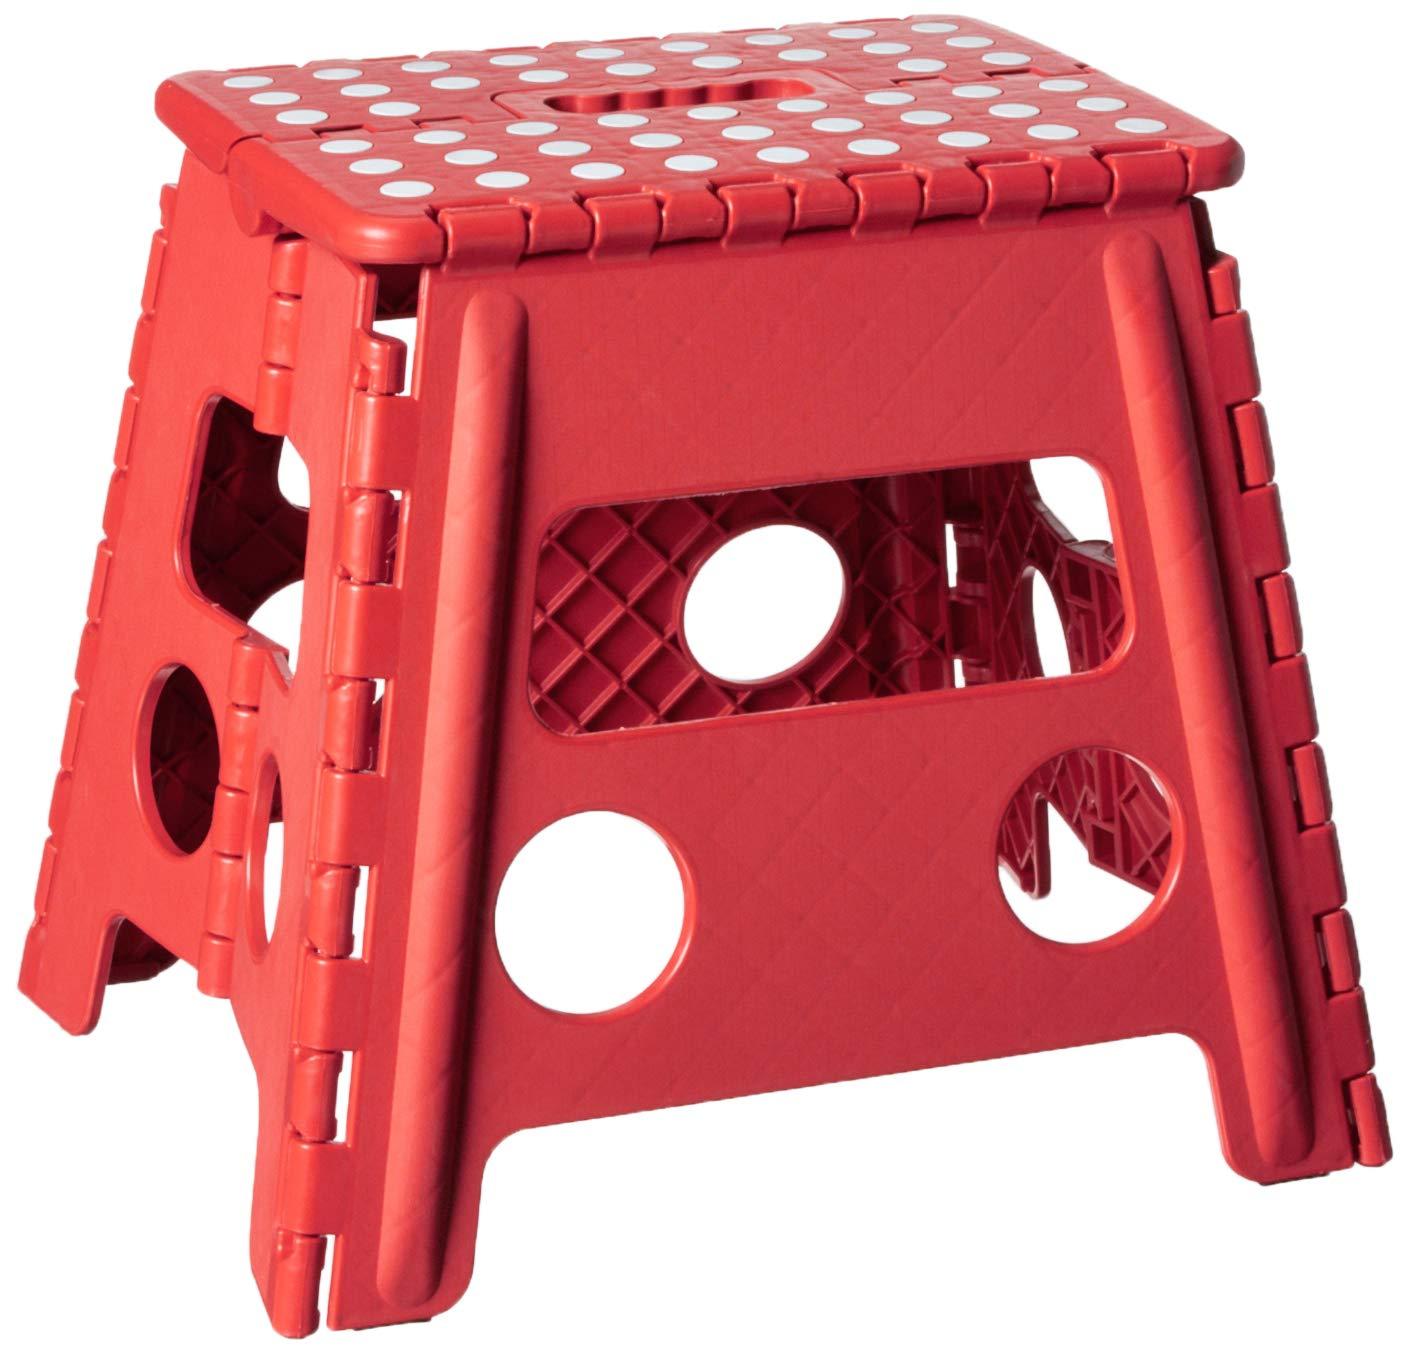 Fabulous Home Basics Large Folding Kids Step Stool With Non Slip Dots Red Ibusinesslaw Wood Chair Design Ideas Ibusinesslaworg